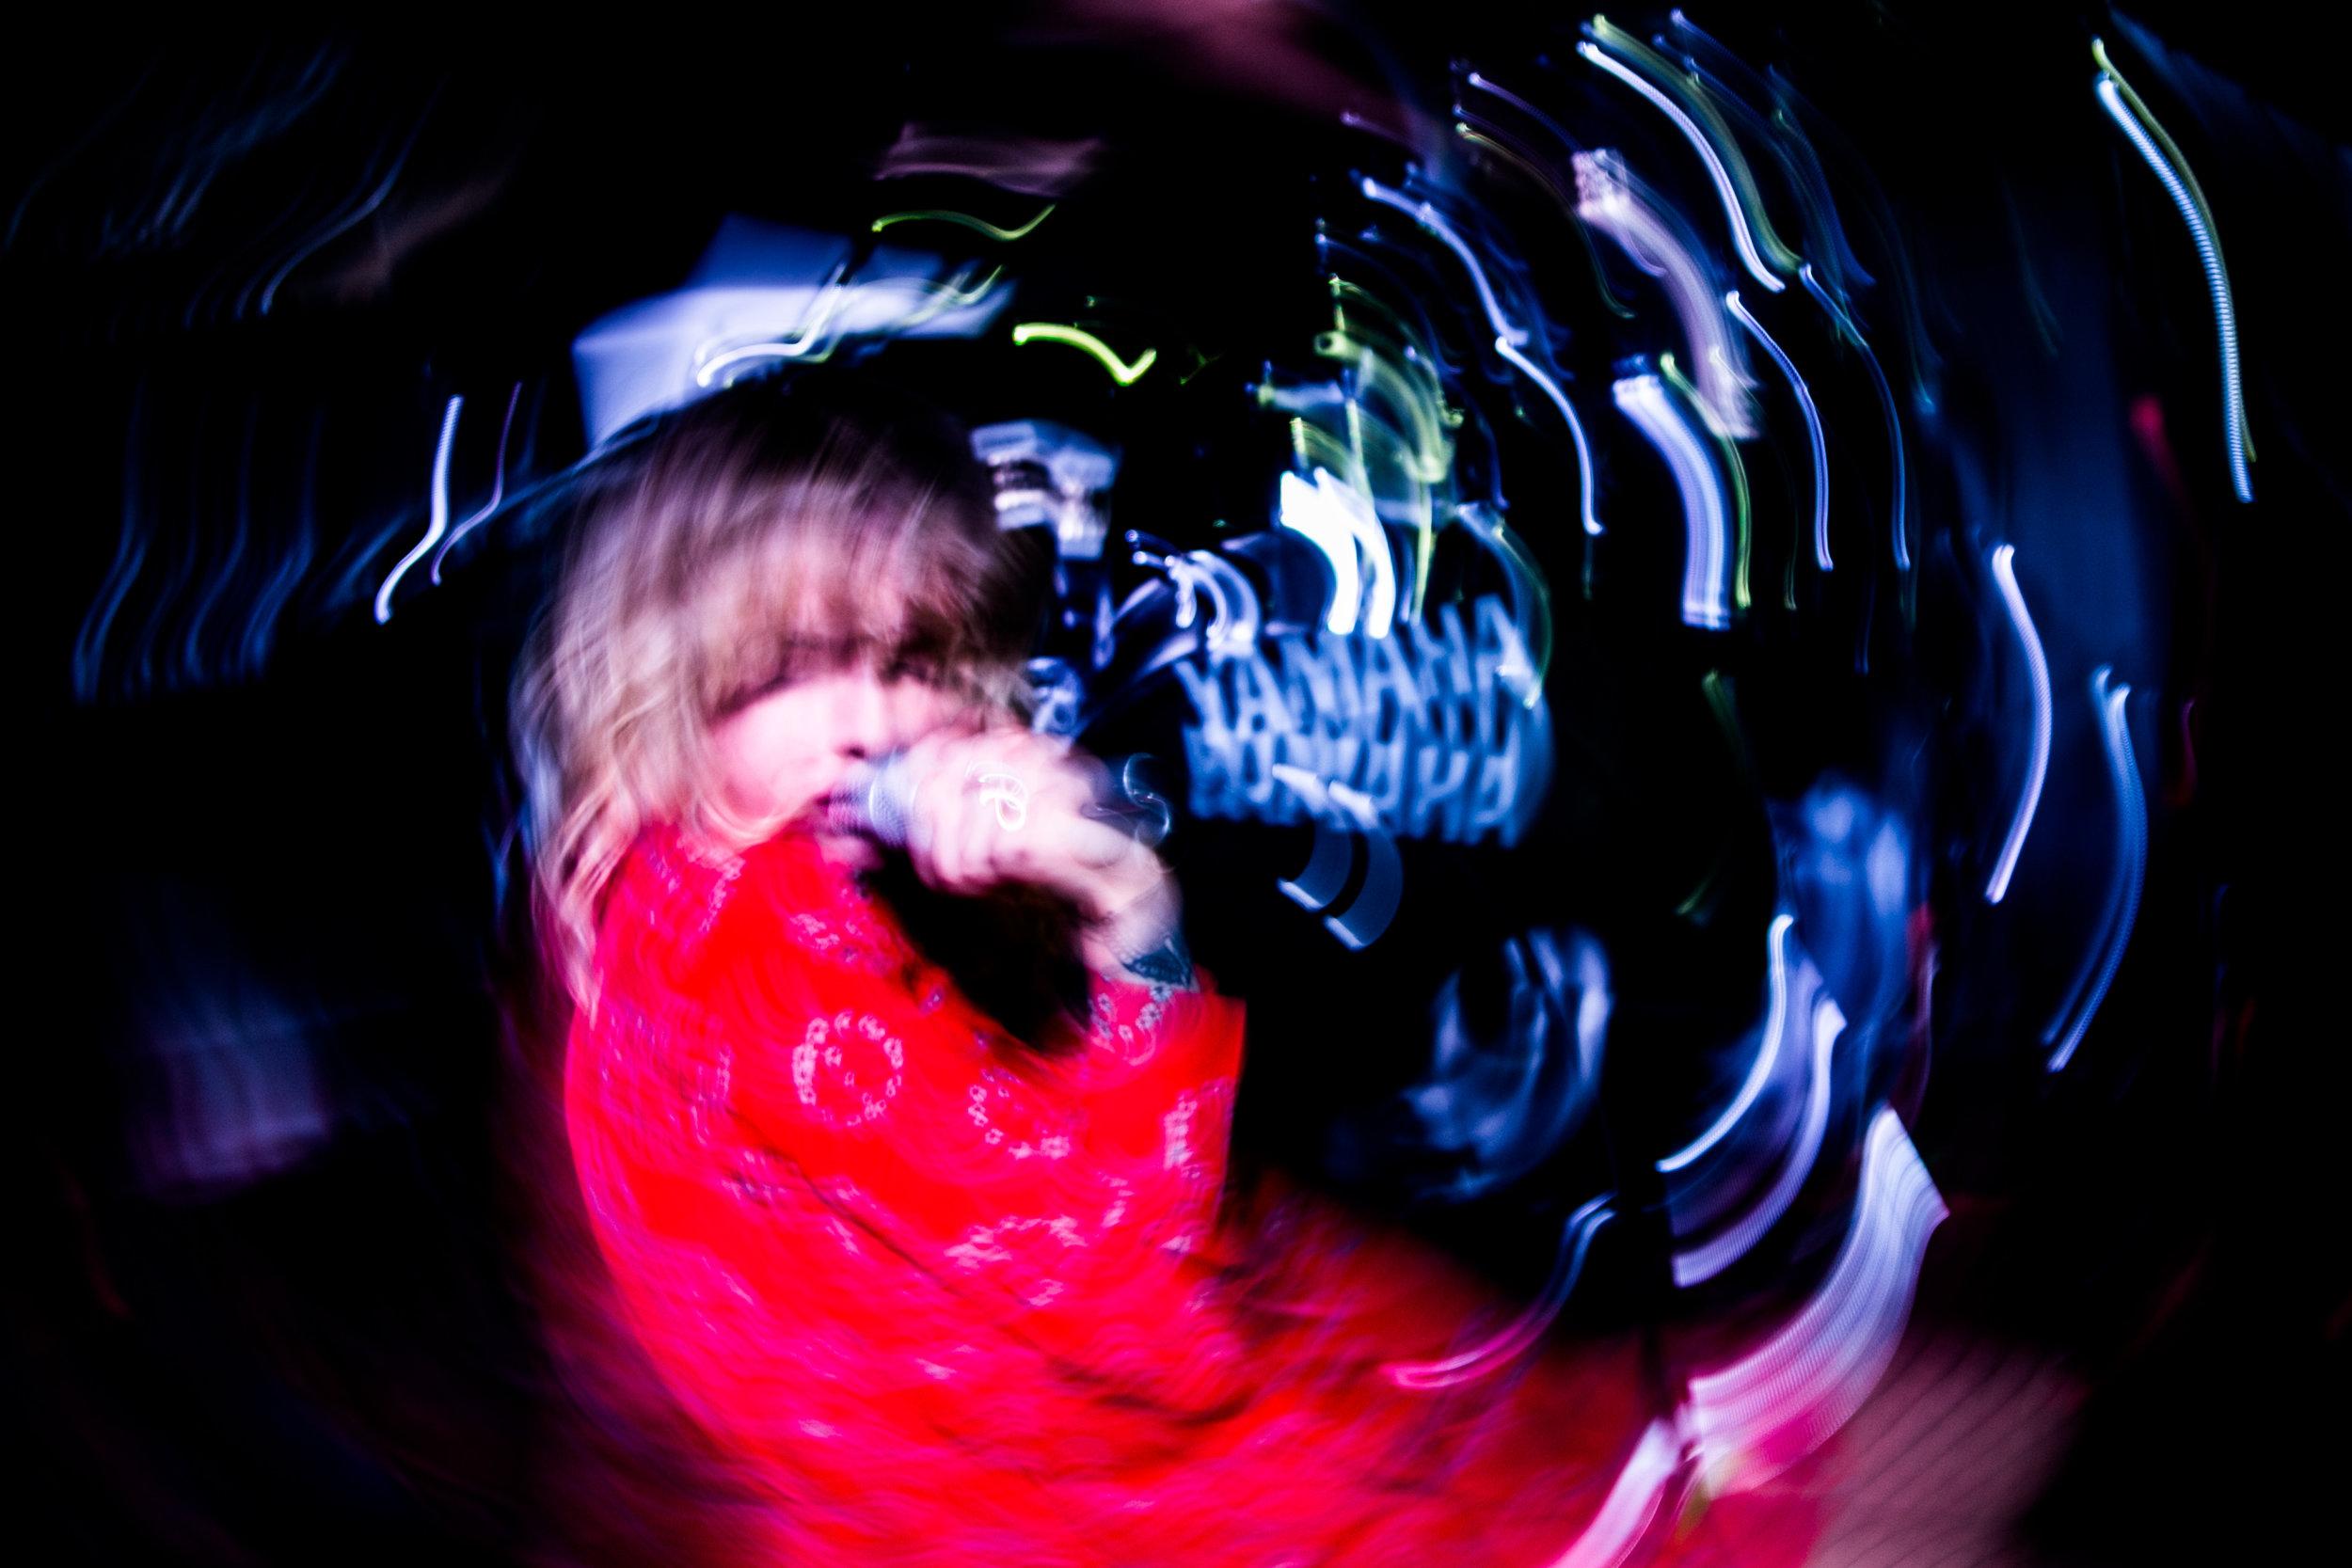 Anteros - Bleach - Great Escape Festival 2017 - Ant Adams-36.jpg